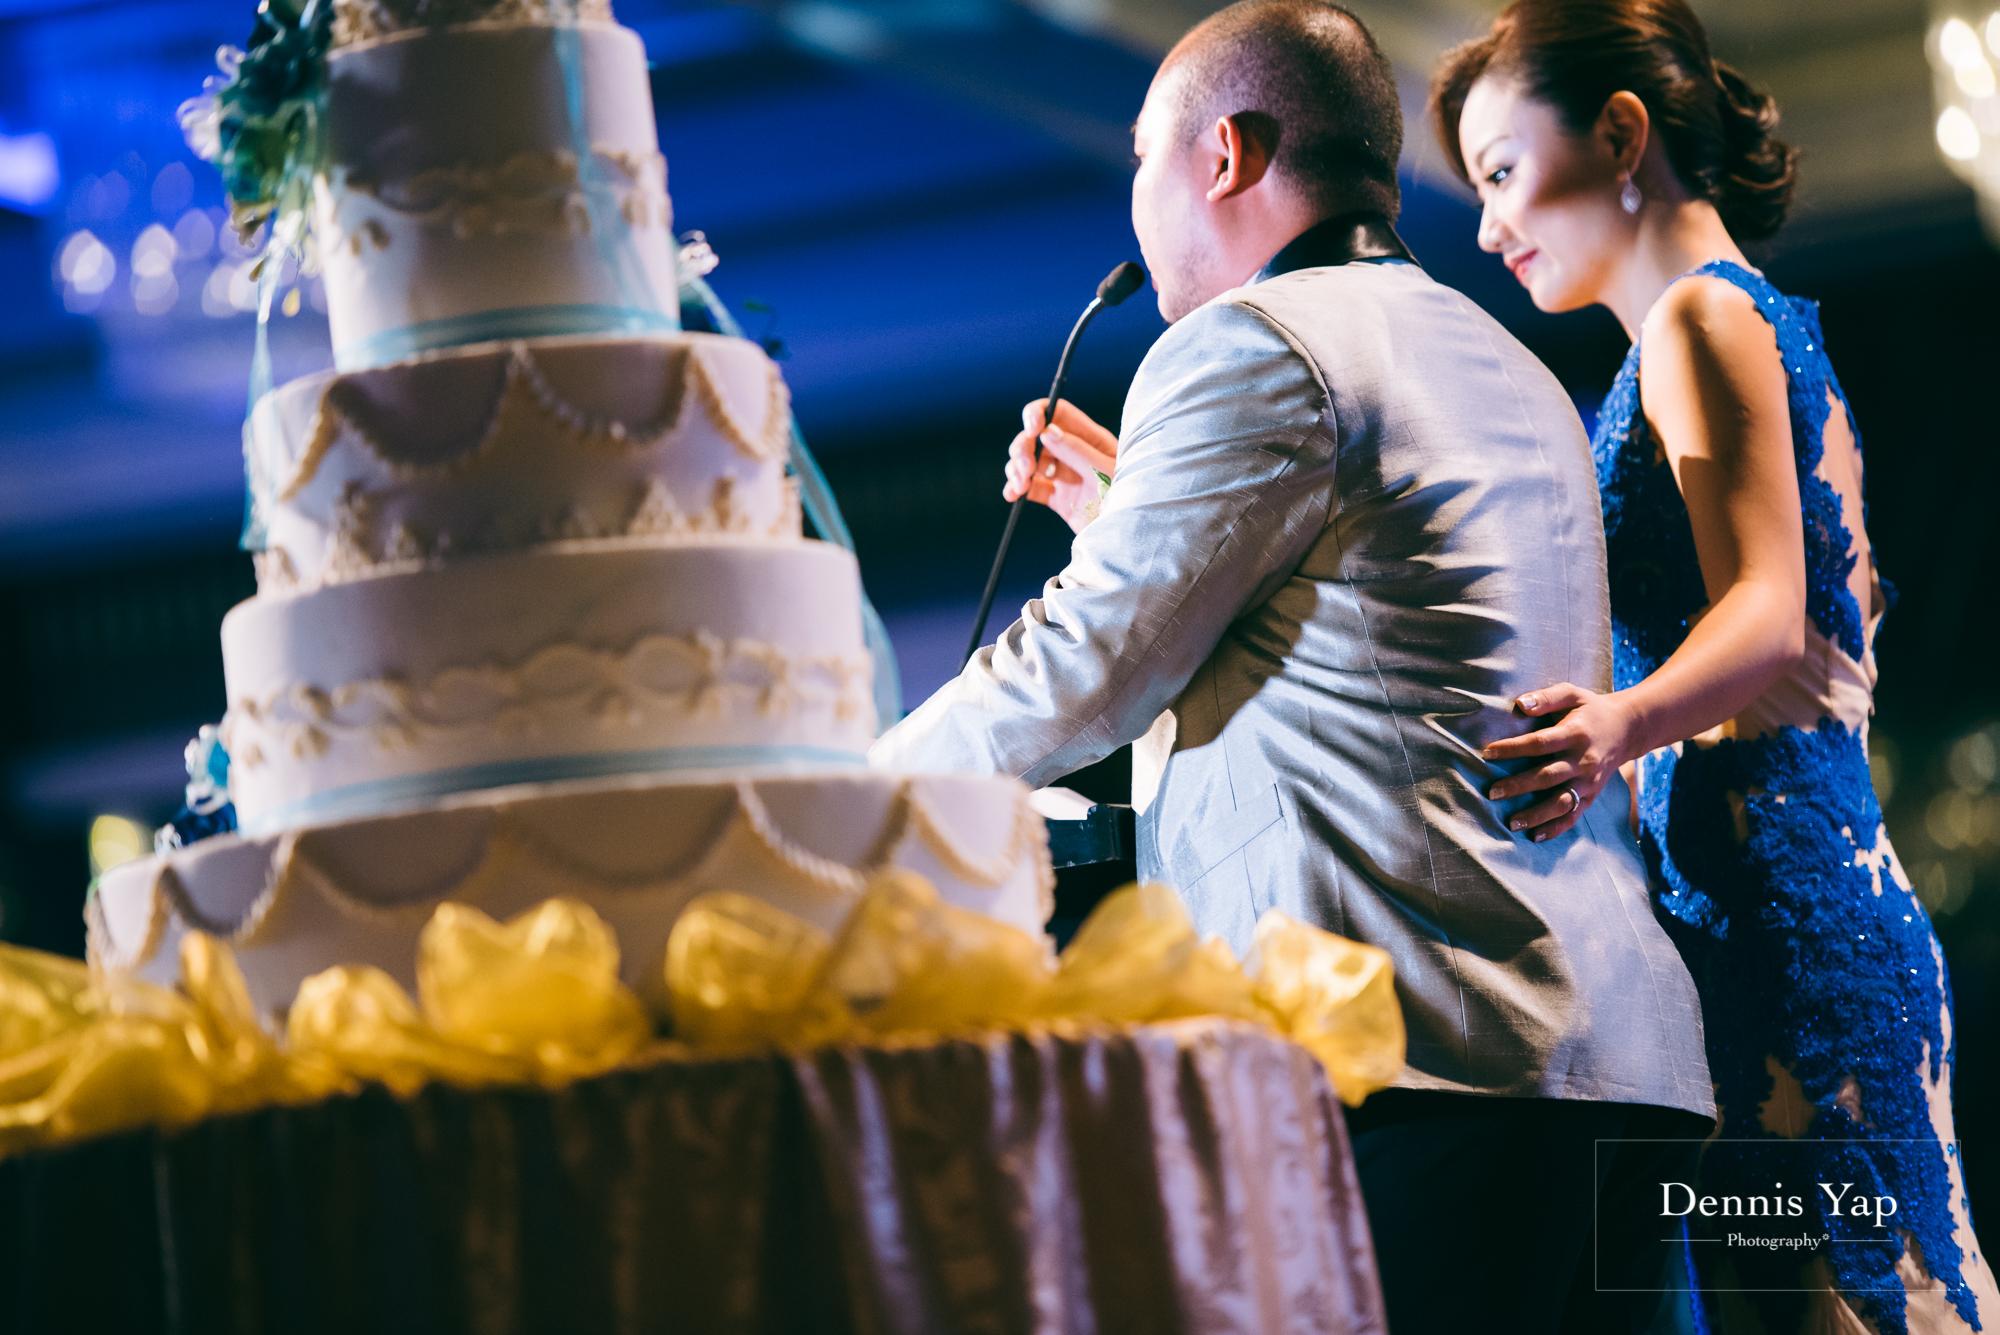 we chard sharon wedding day gate crash majestic hotel kuala lumpur moonlight dennis yap photography malaysia-51.jpg